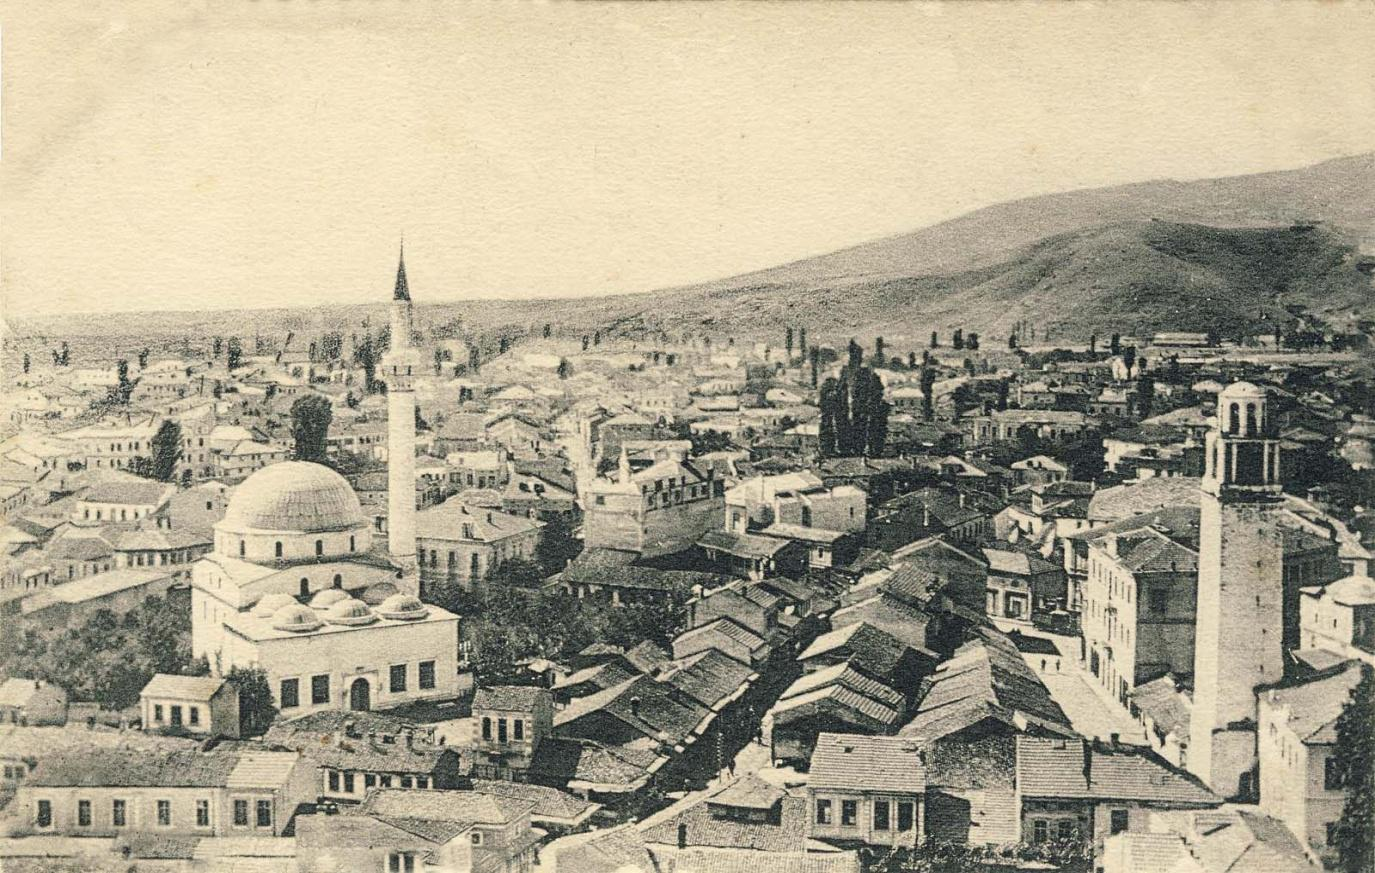 Manastiri, ne vitin 1910